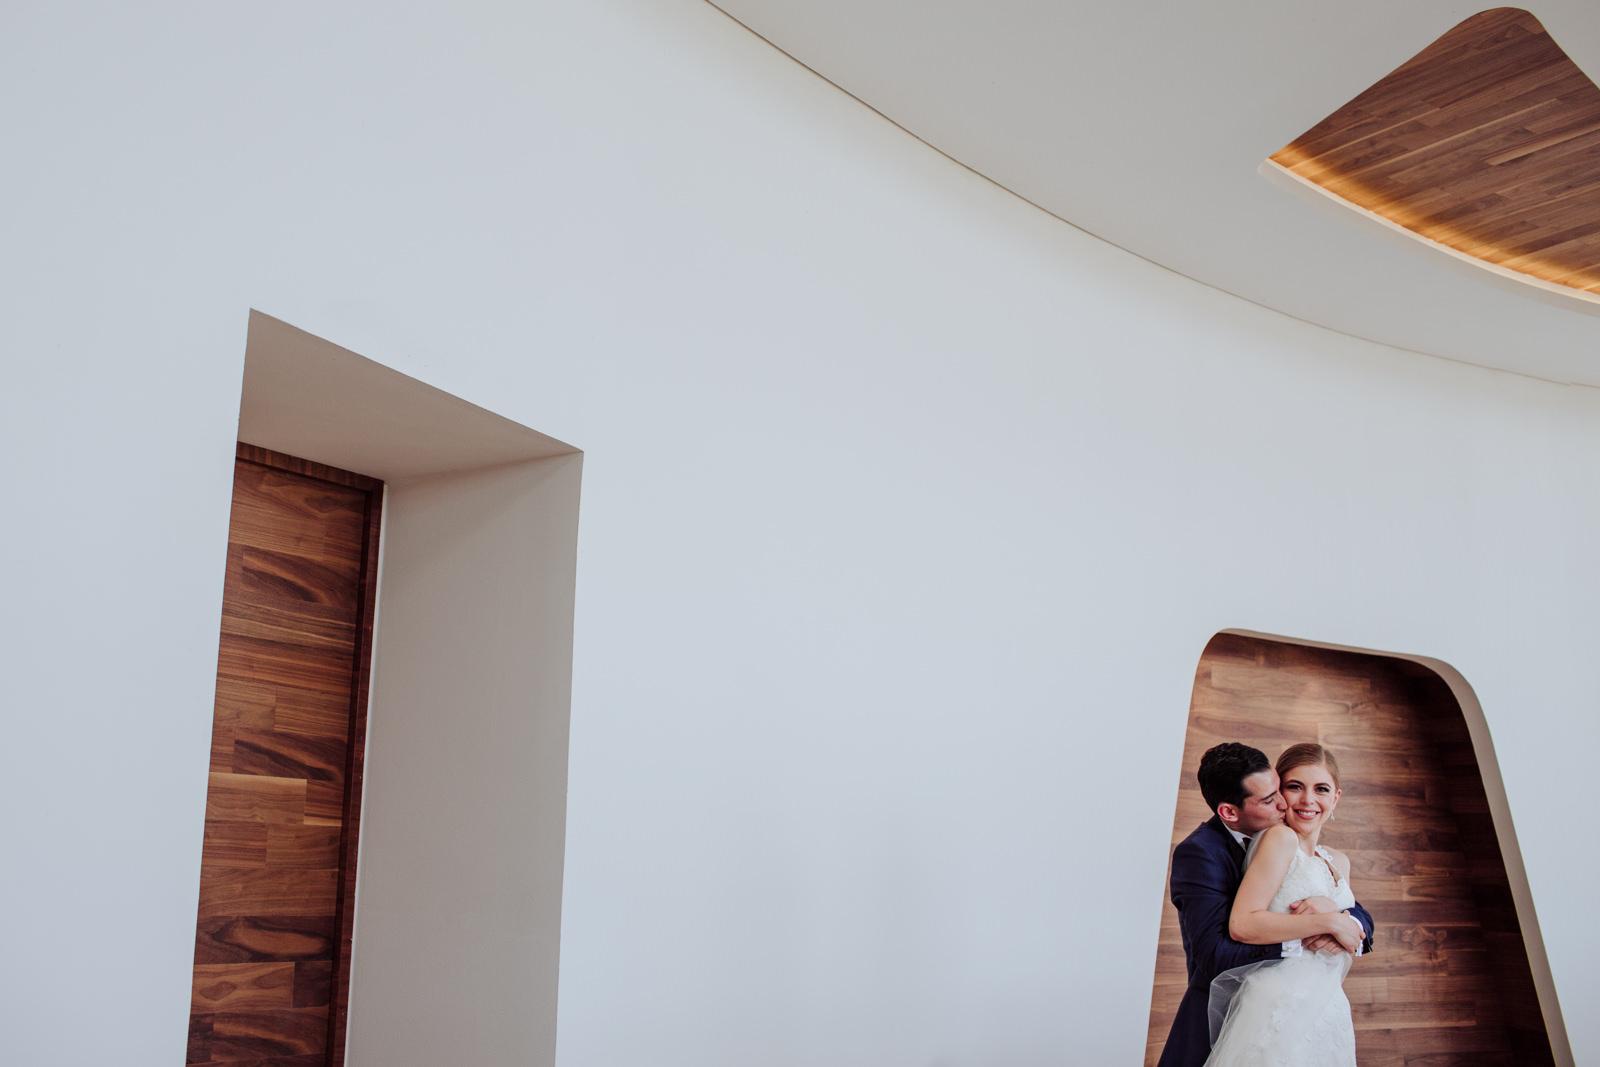 boda en altozano la nueva laguna torreon